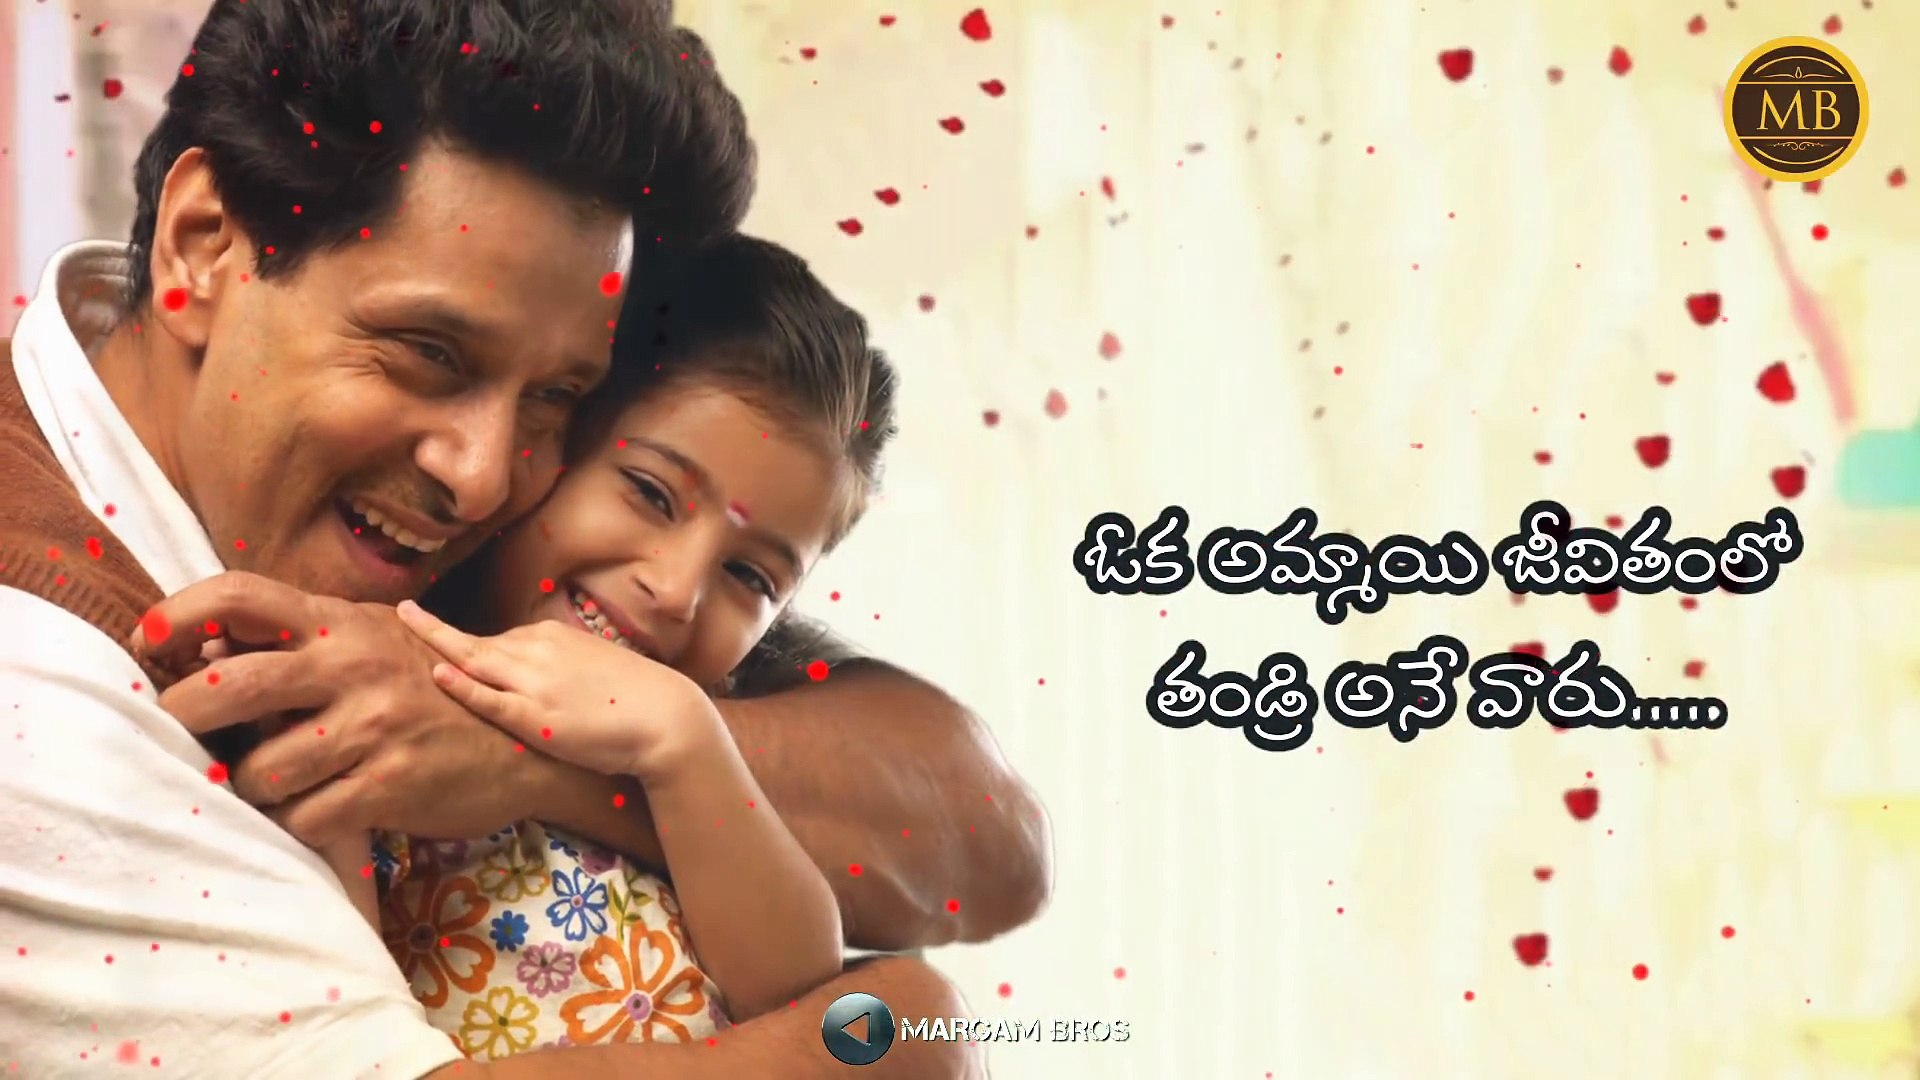 Emotional Father S Sad Quotes Whatsapp Status Video Telugu Whatsapp Status Video Whatsapp Status Videos Whatsapp Status Love In English Whatsapp Status Best Whatsapp Love Status Happy Whatsapp Status Whatsapp Status Sad Whatsapp